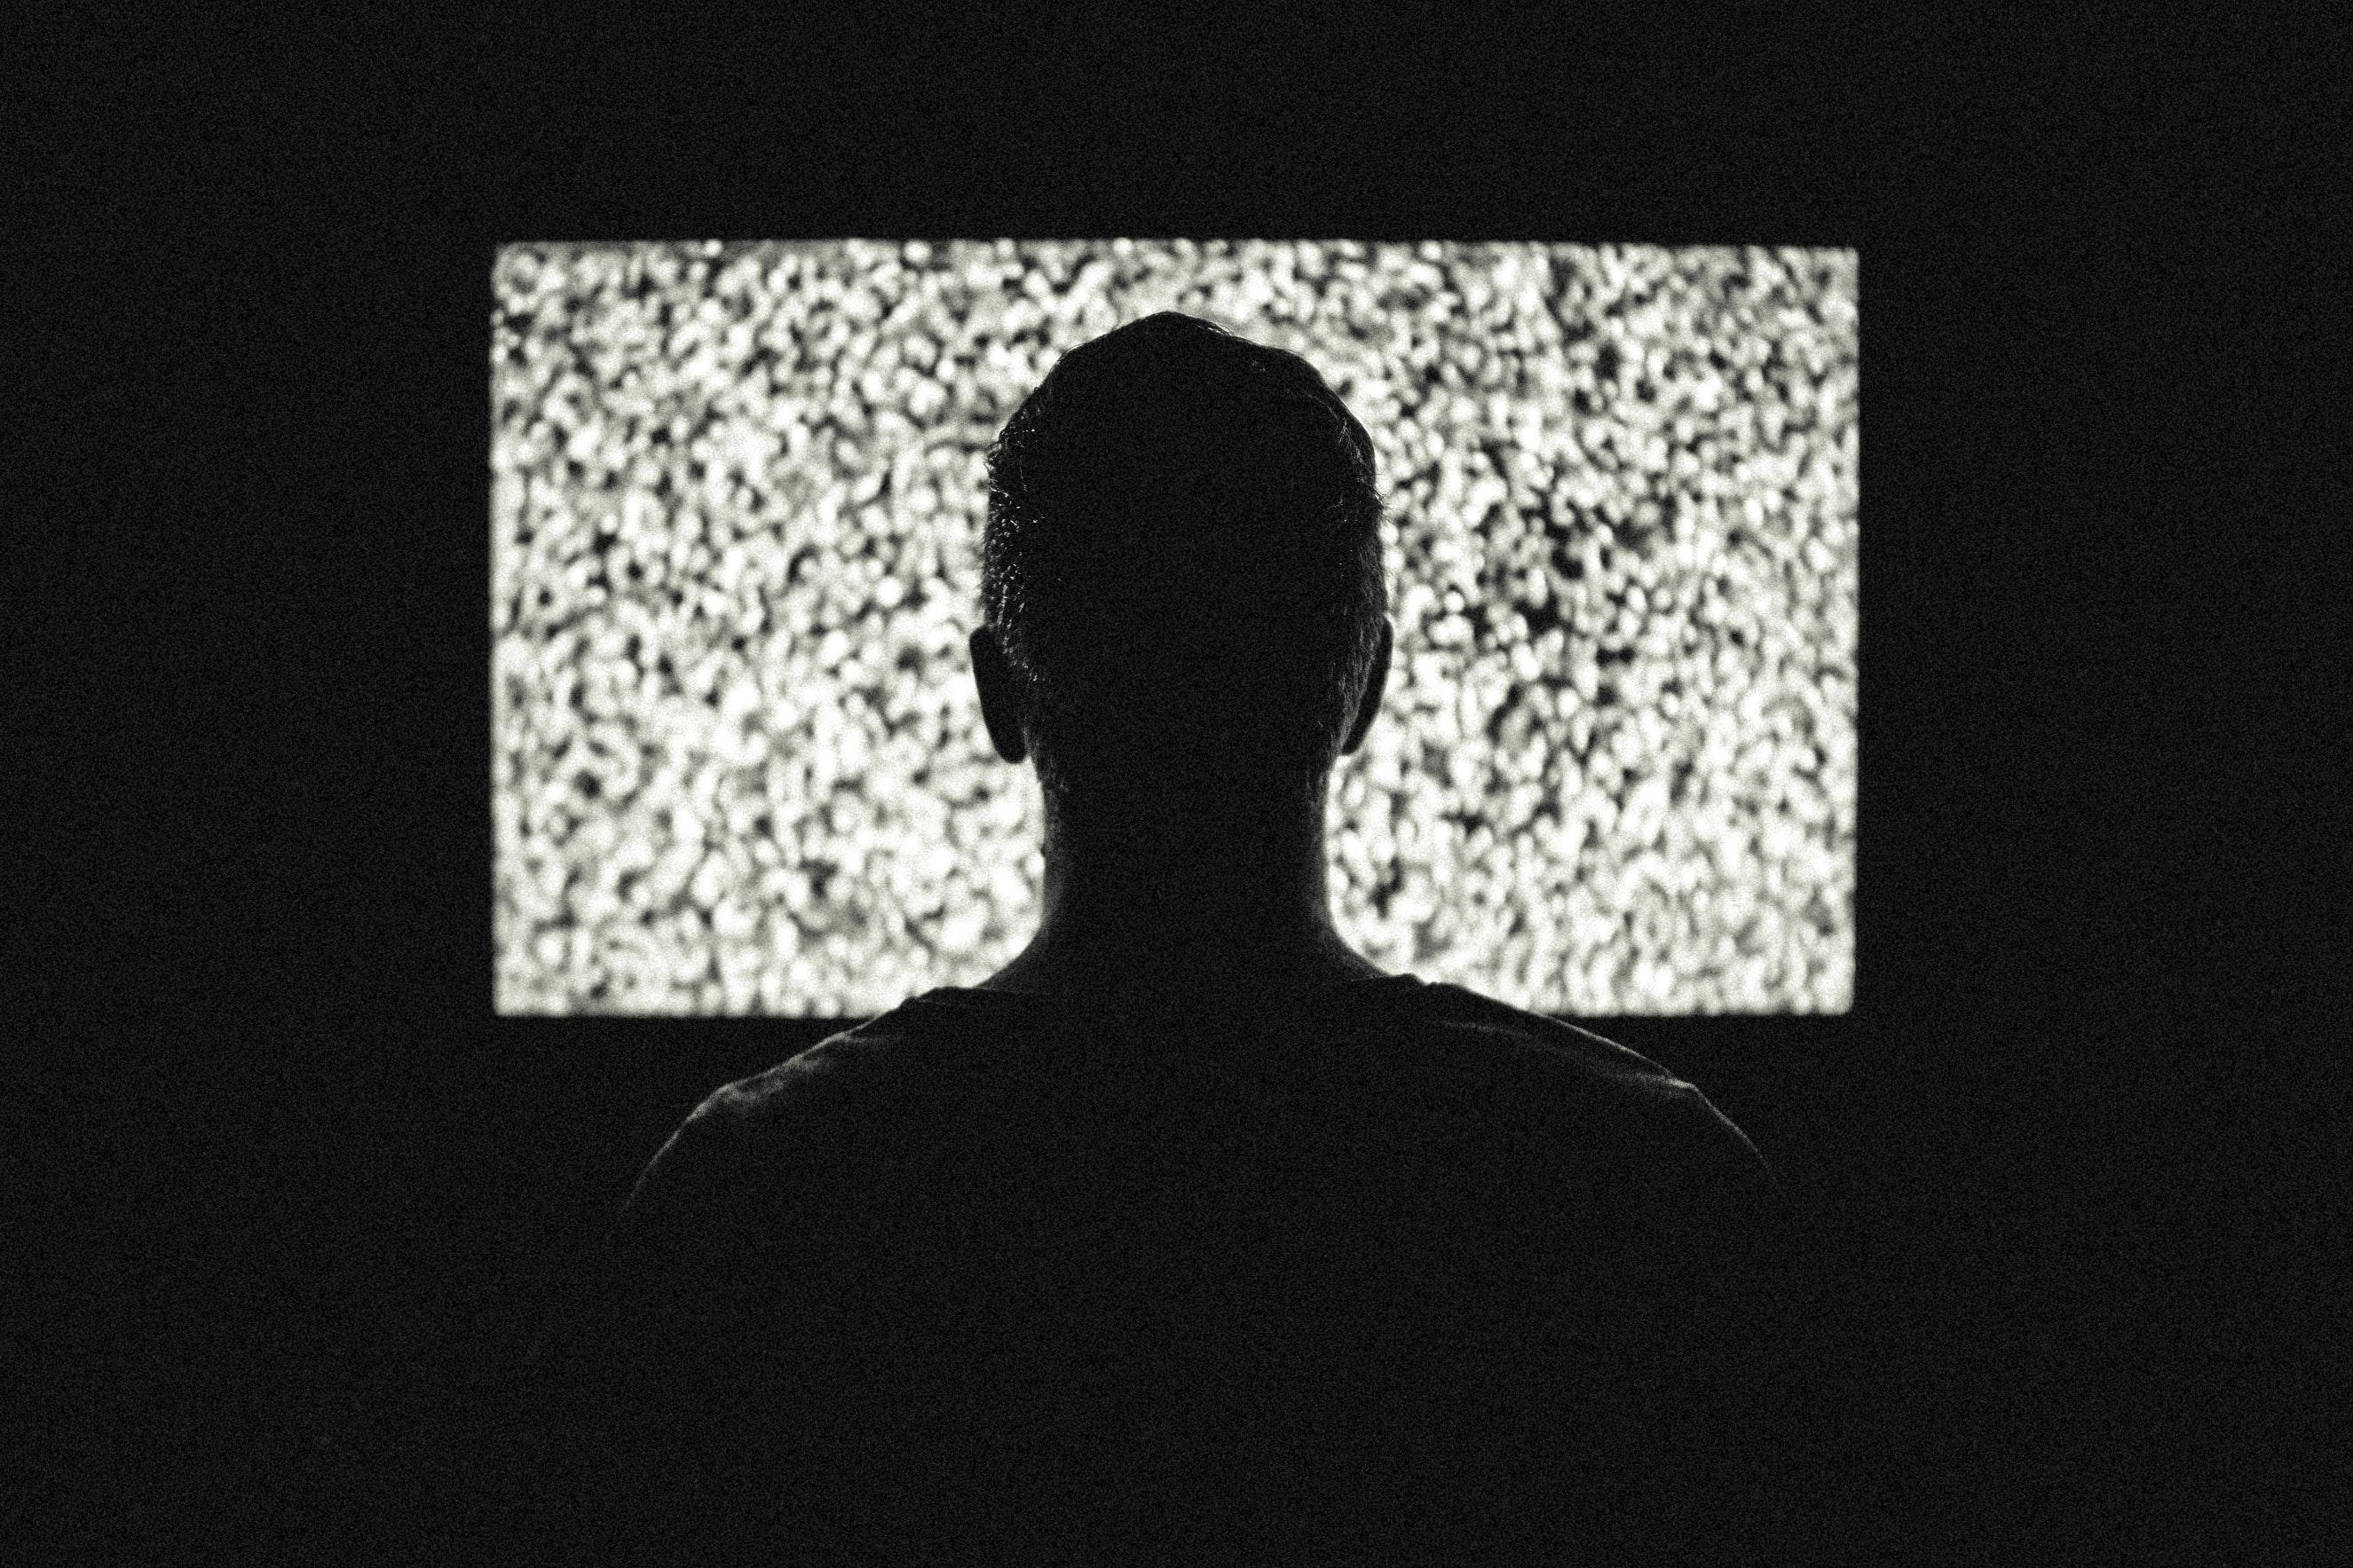 cinema-dark-display-8158